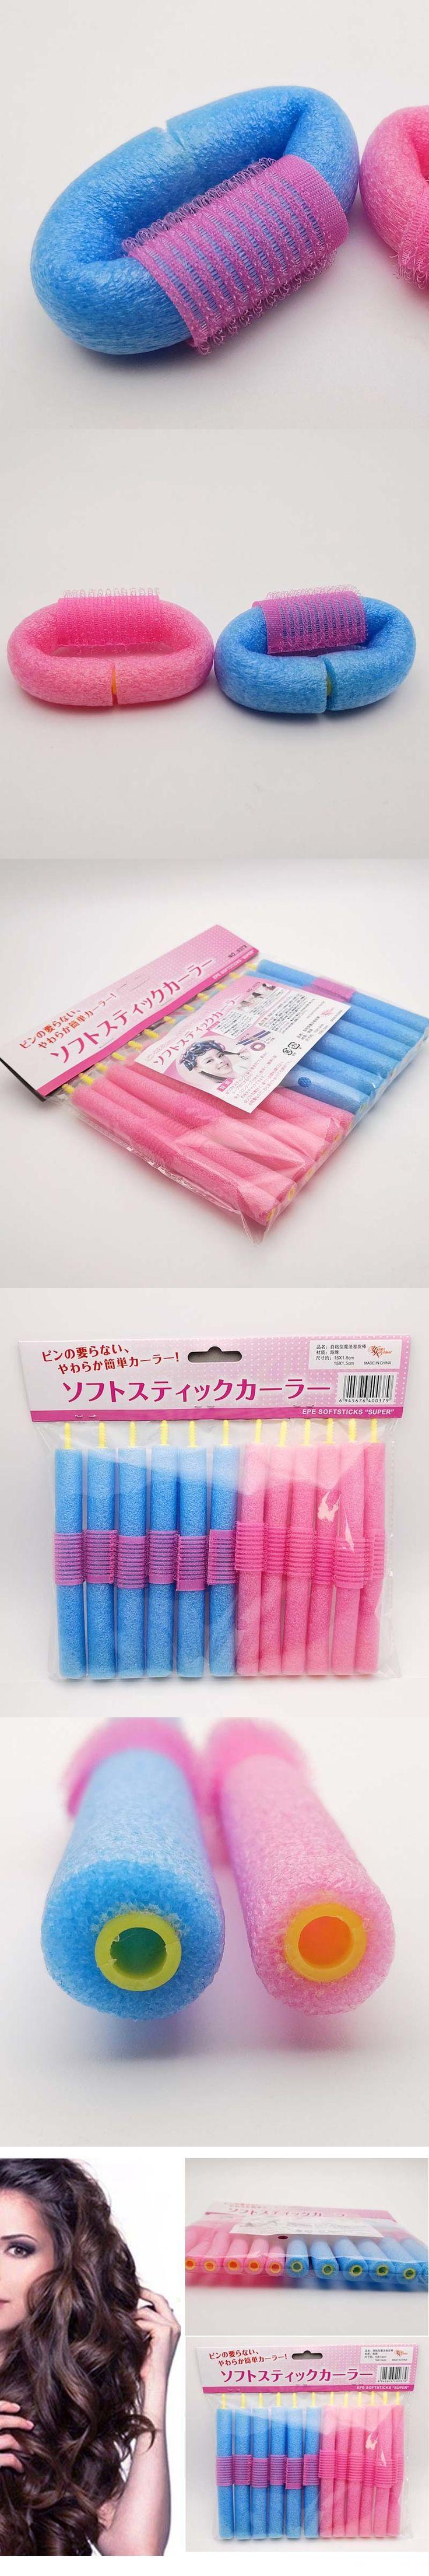 12pcs/pack Pearl Sponge Foam Curly Hair Roller Stick Self-adhesive Curling Tools Soft Curling Hair